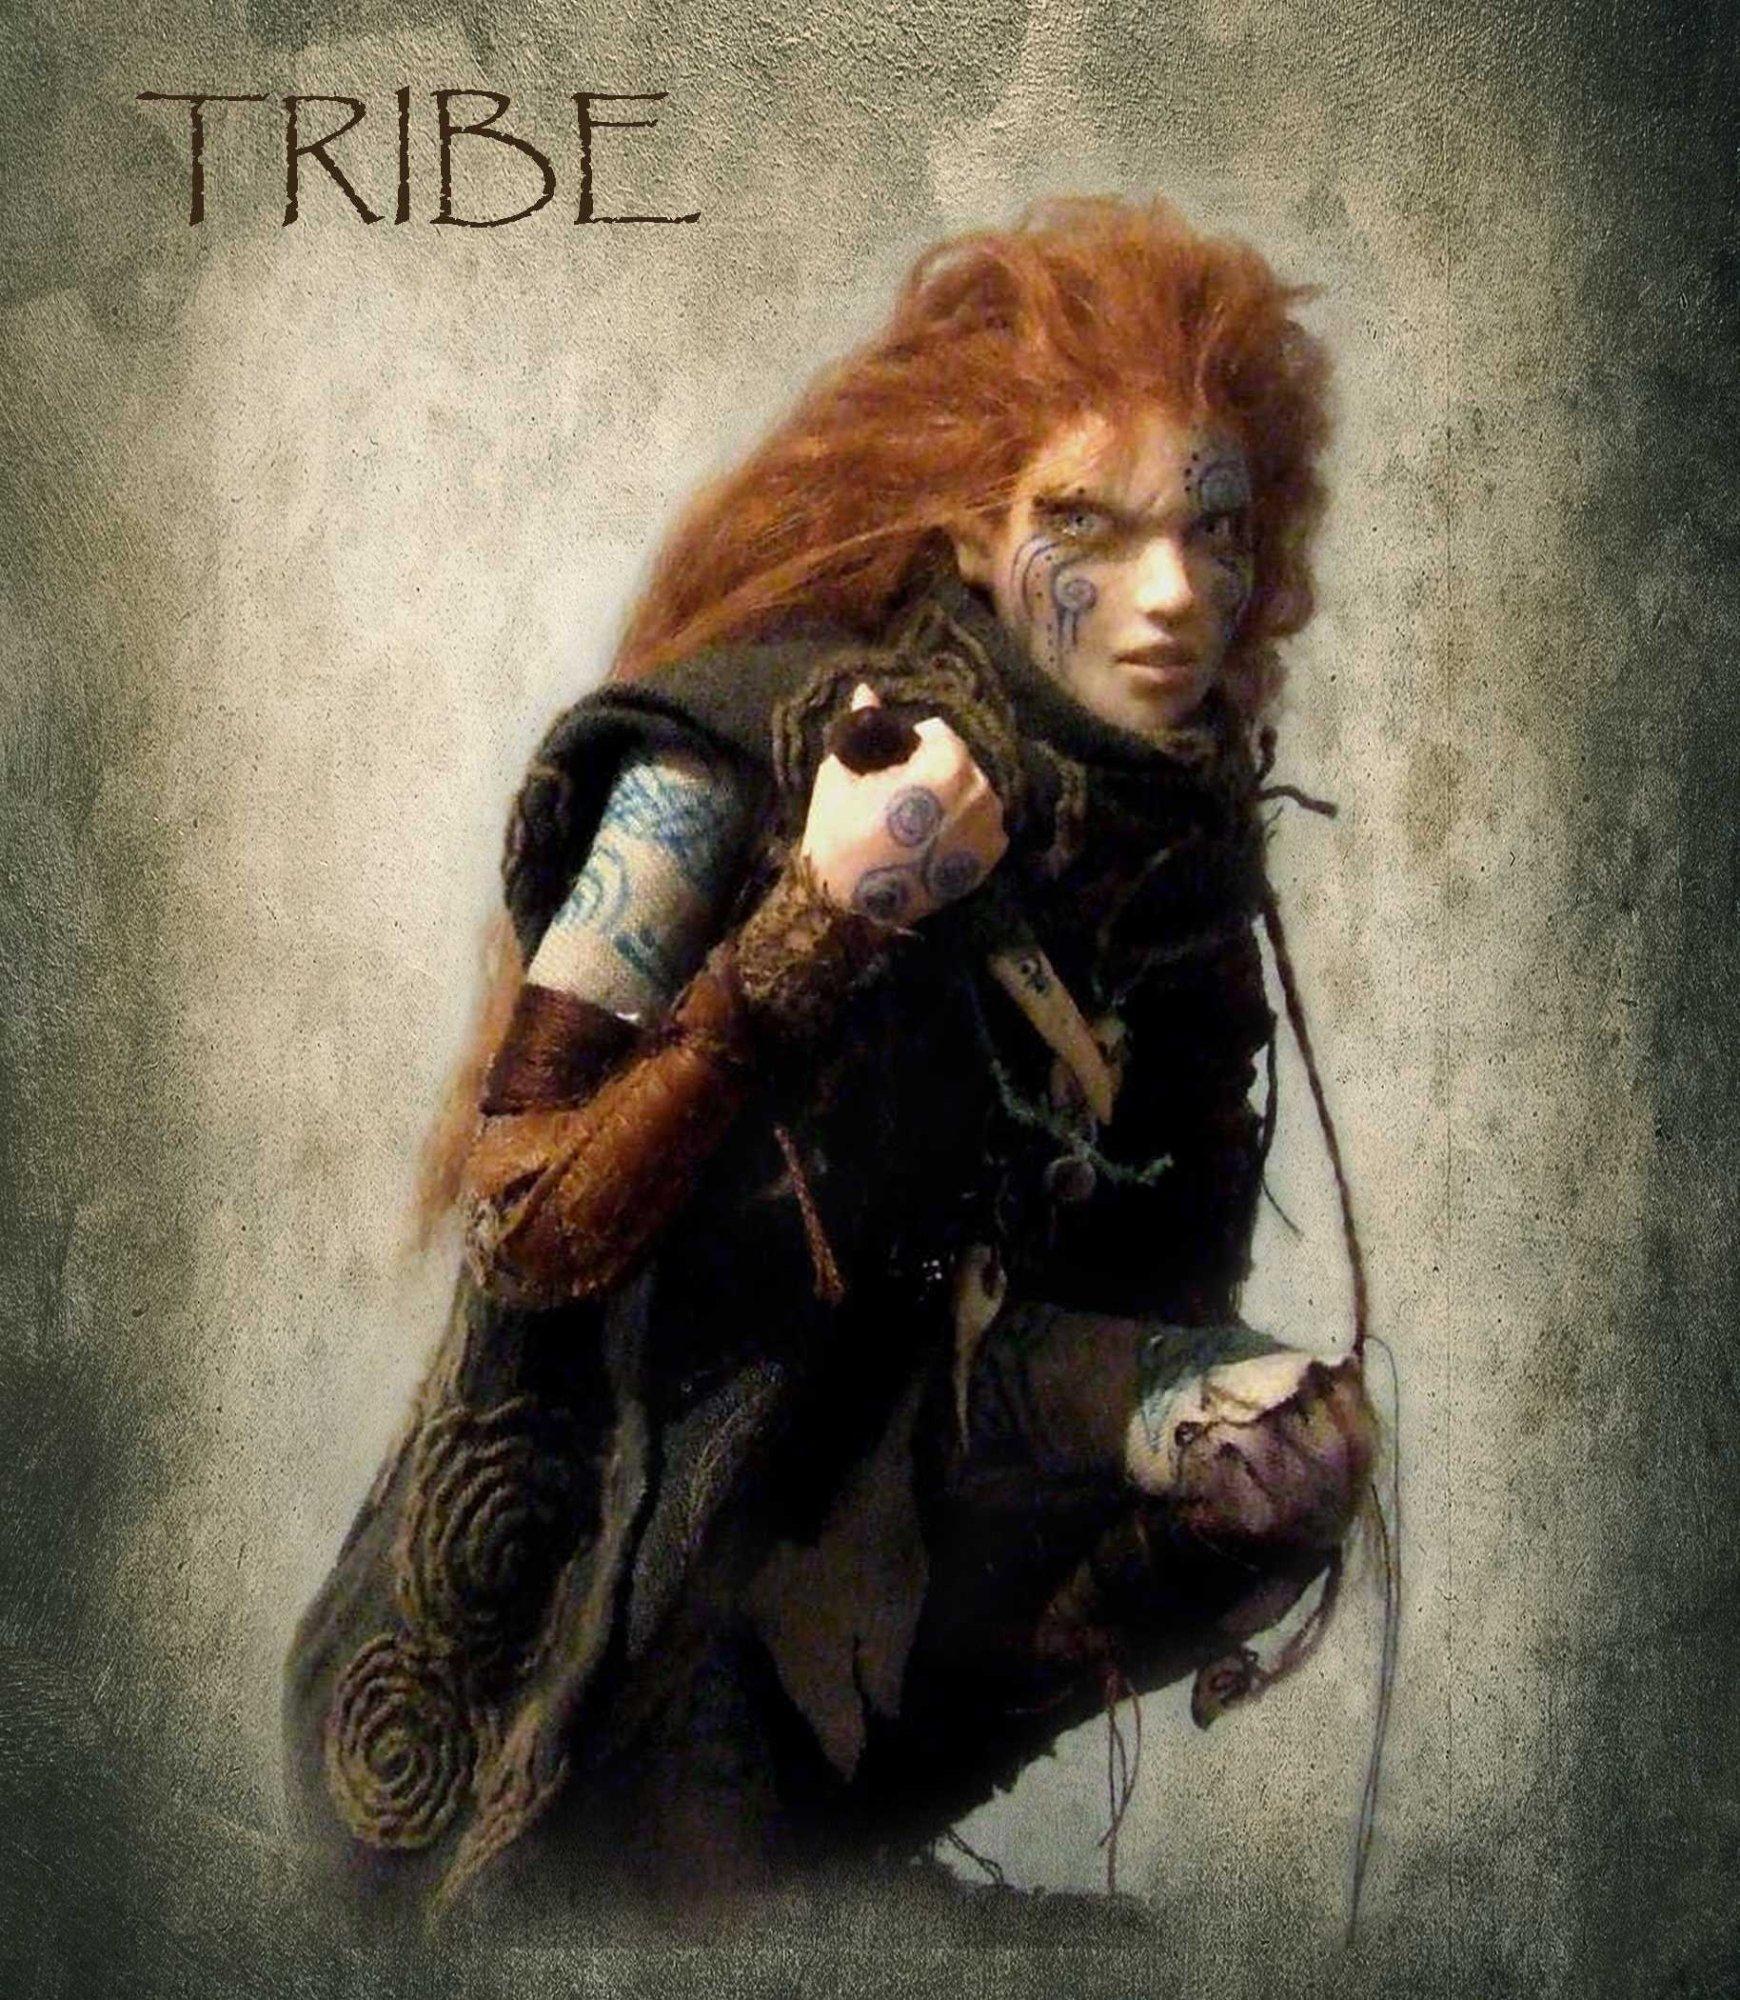 celtic warrior - Google Search   Painting ideas   Pinterest ...